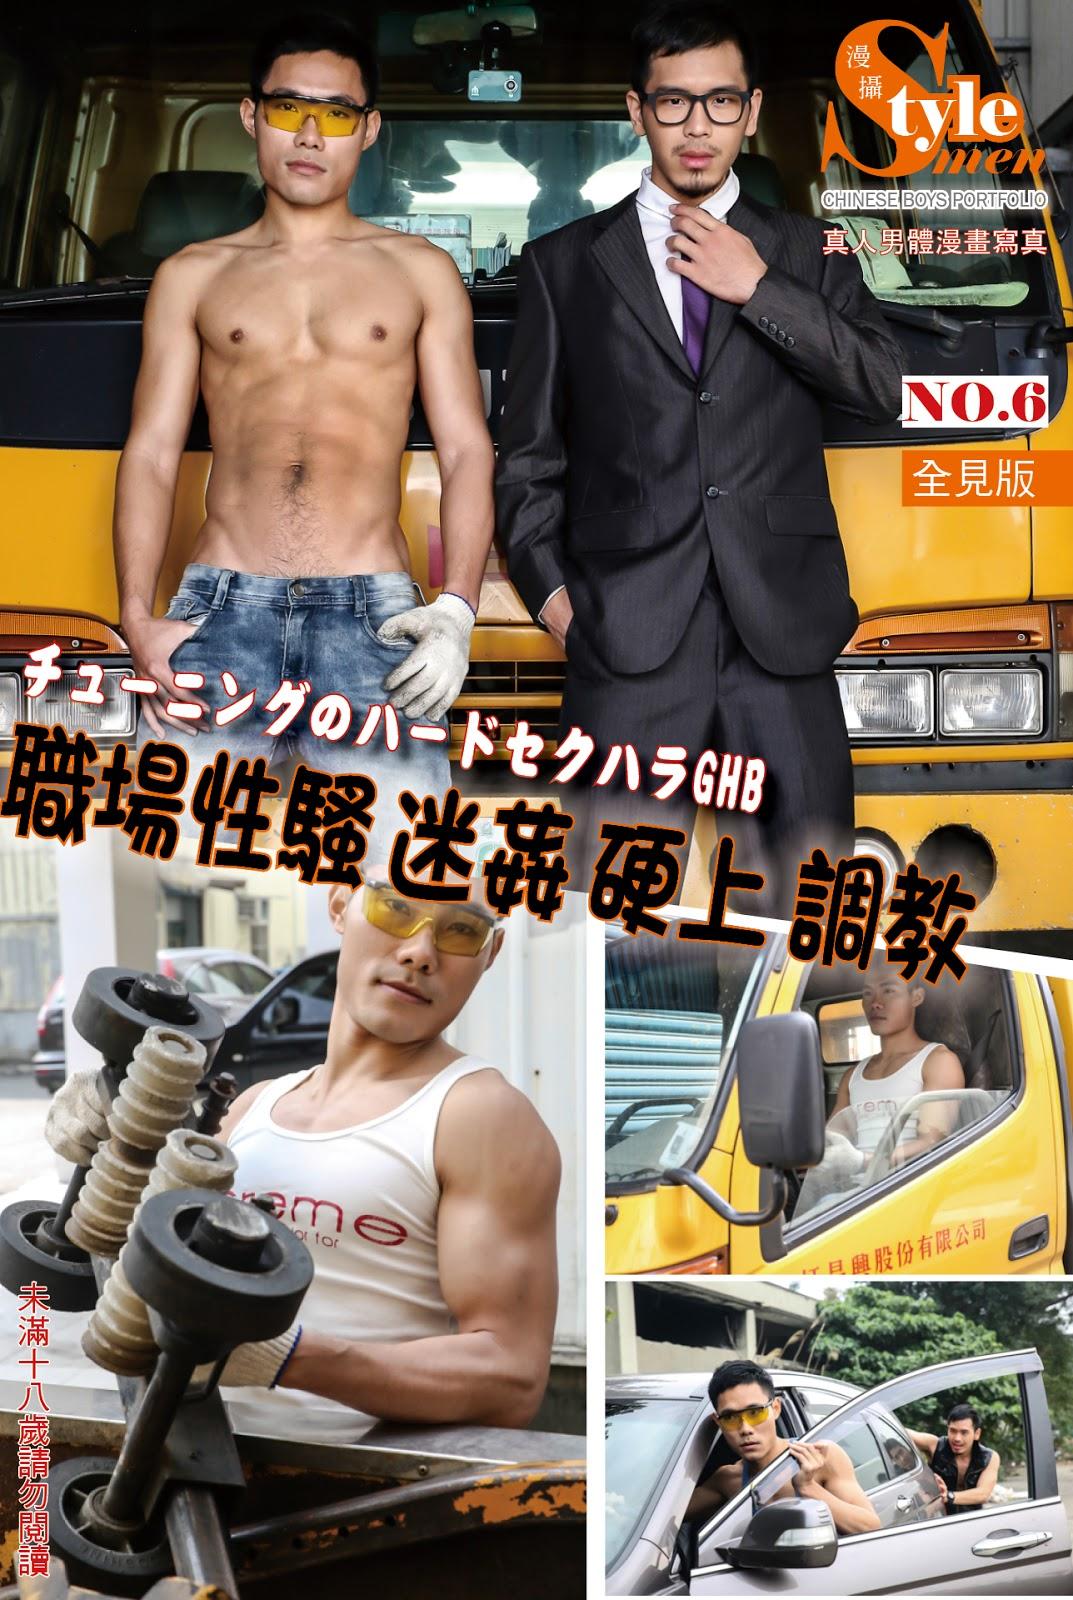 Style men型男幫 漫攝 N0.6